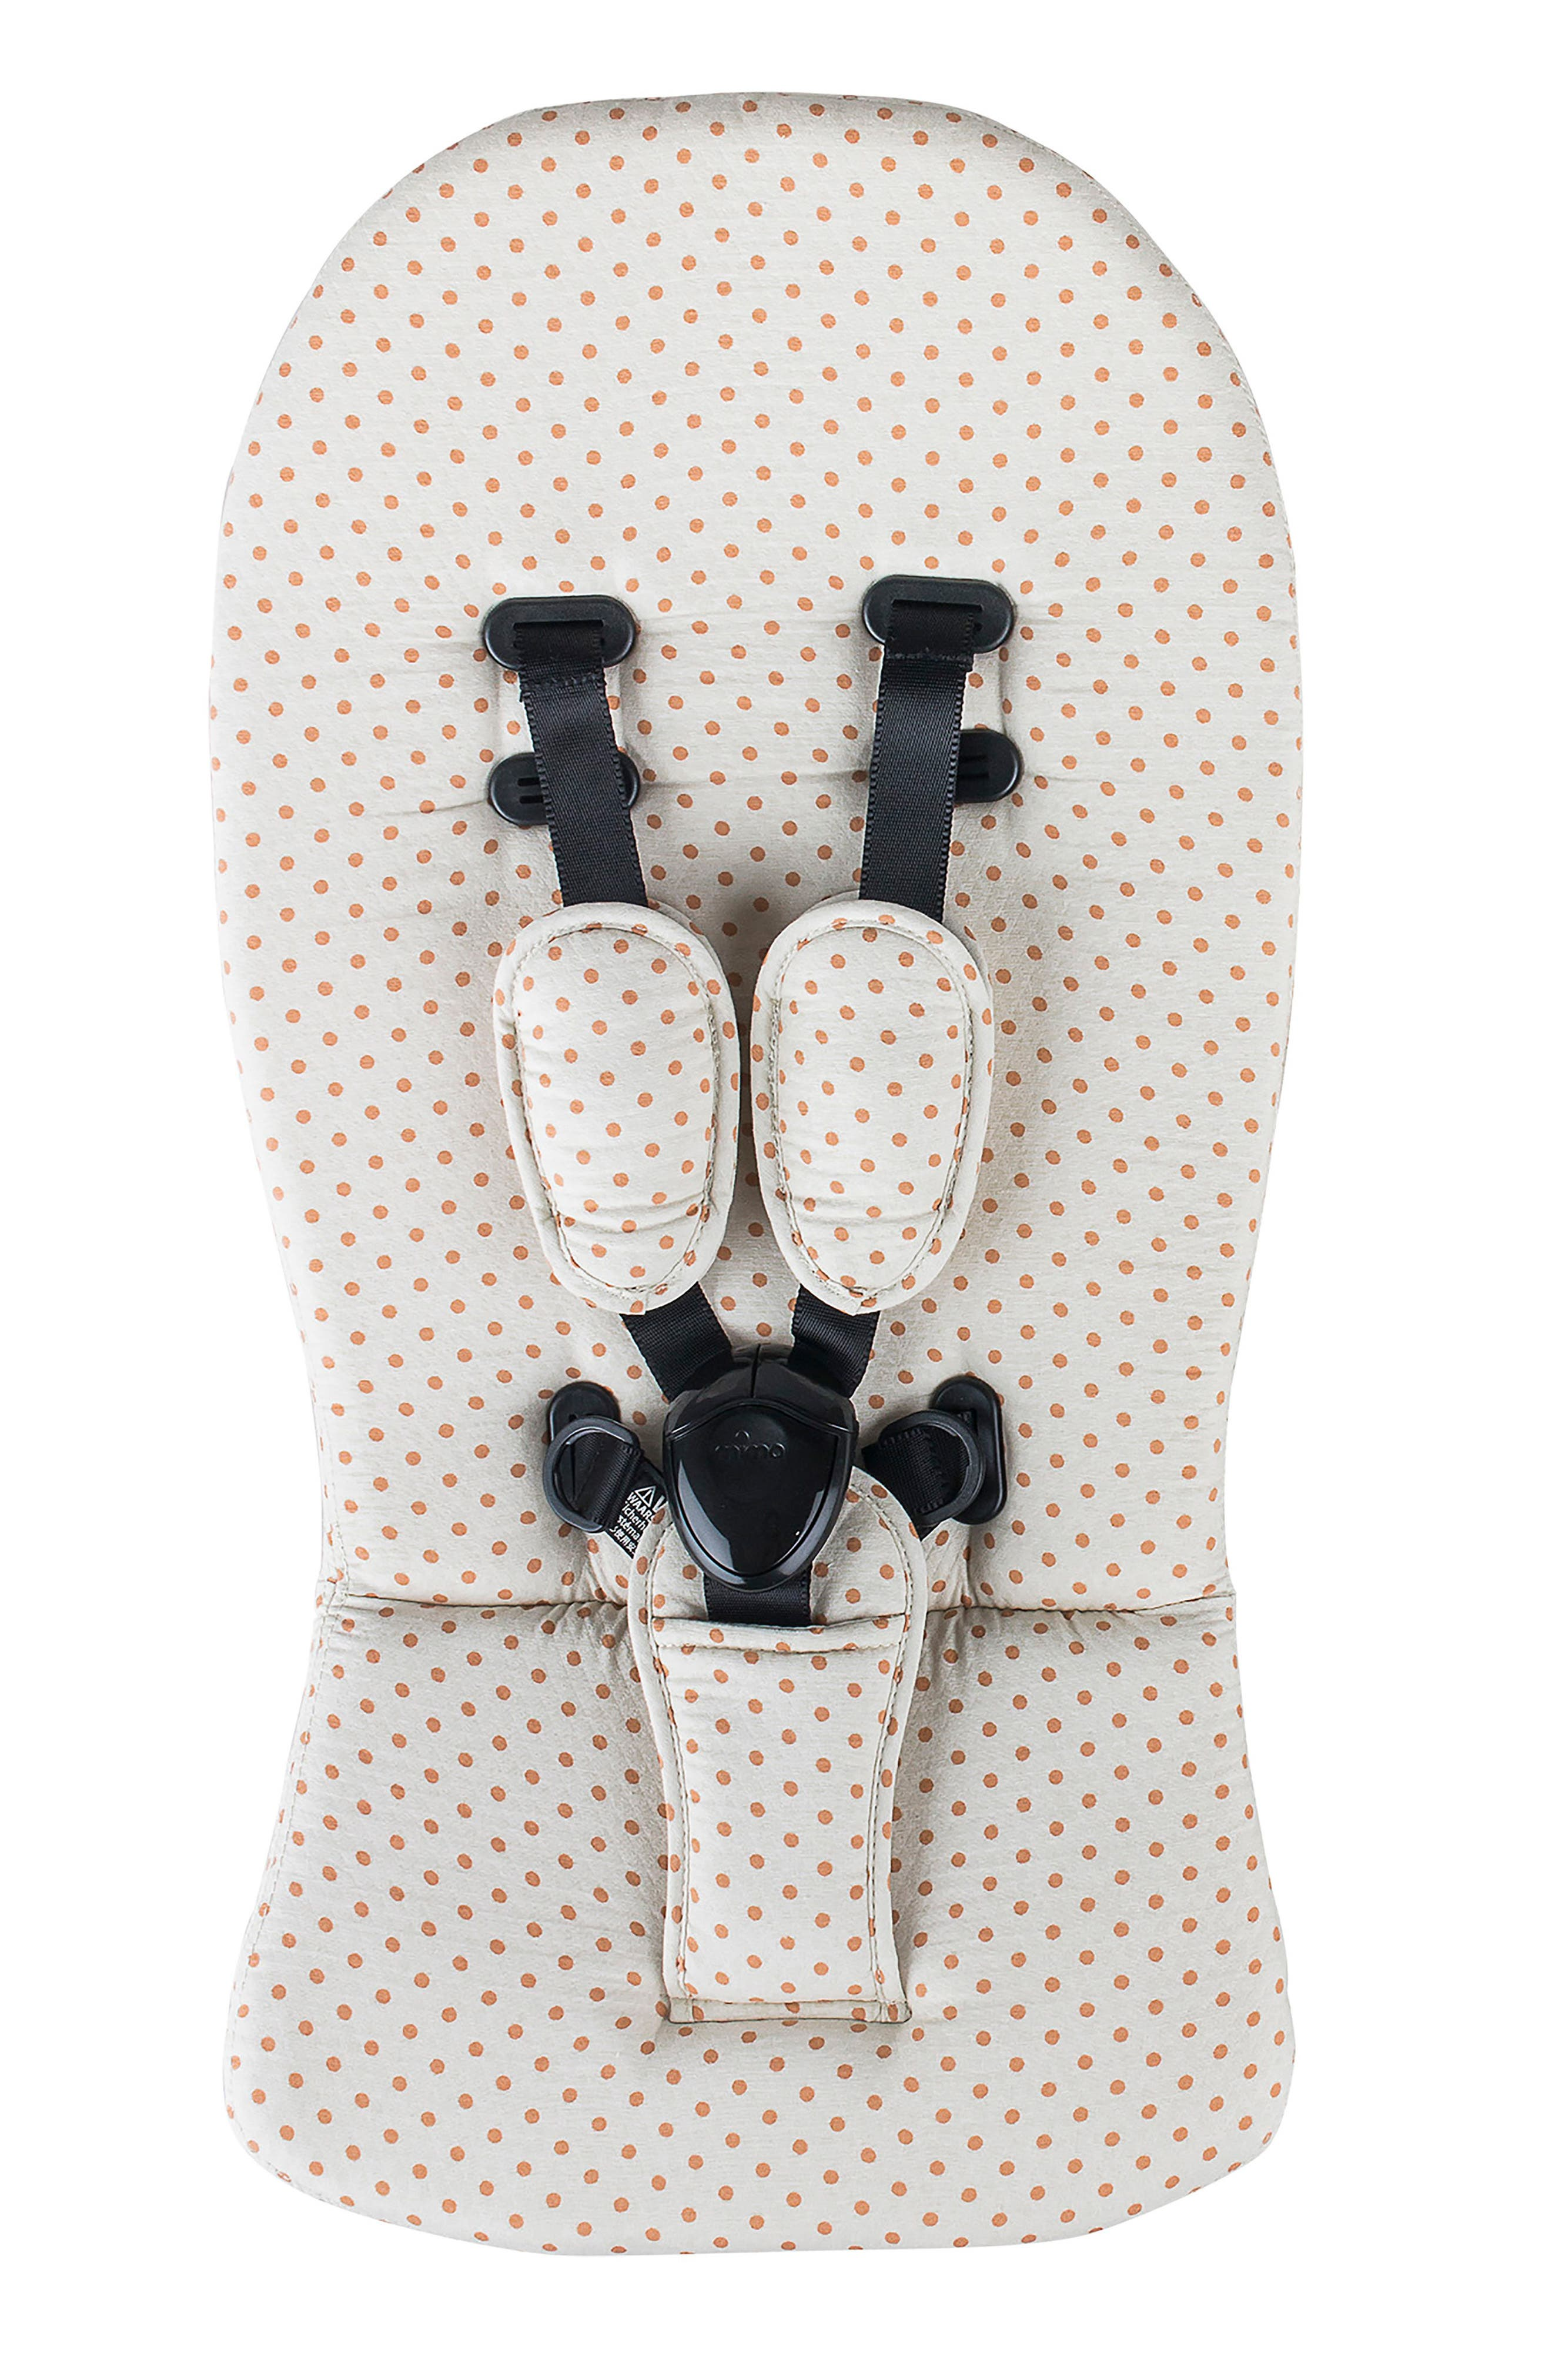 Main Image - Mima Comfort Padding Kit for Mima Xari or Kobi Strollers